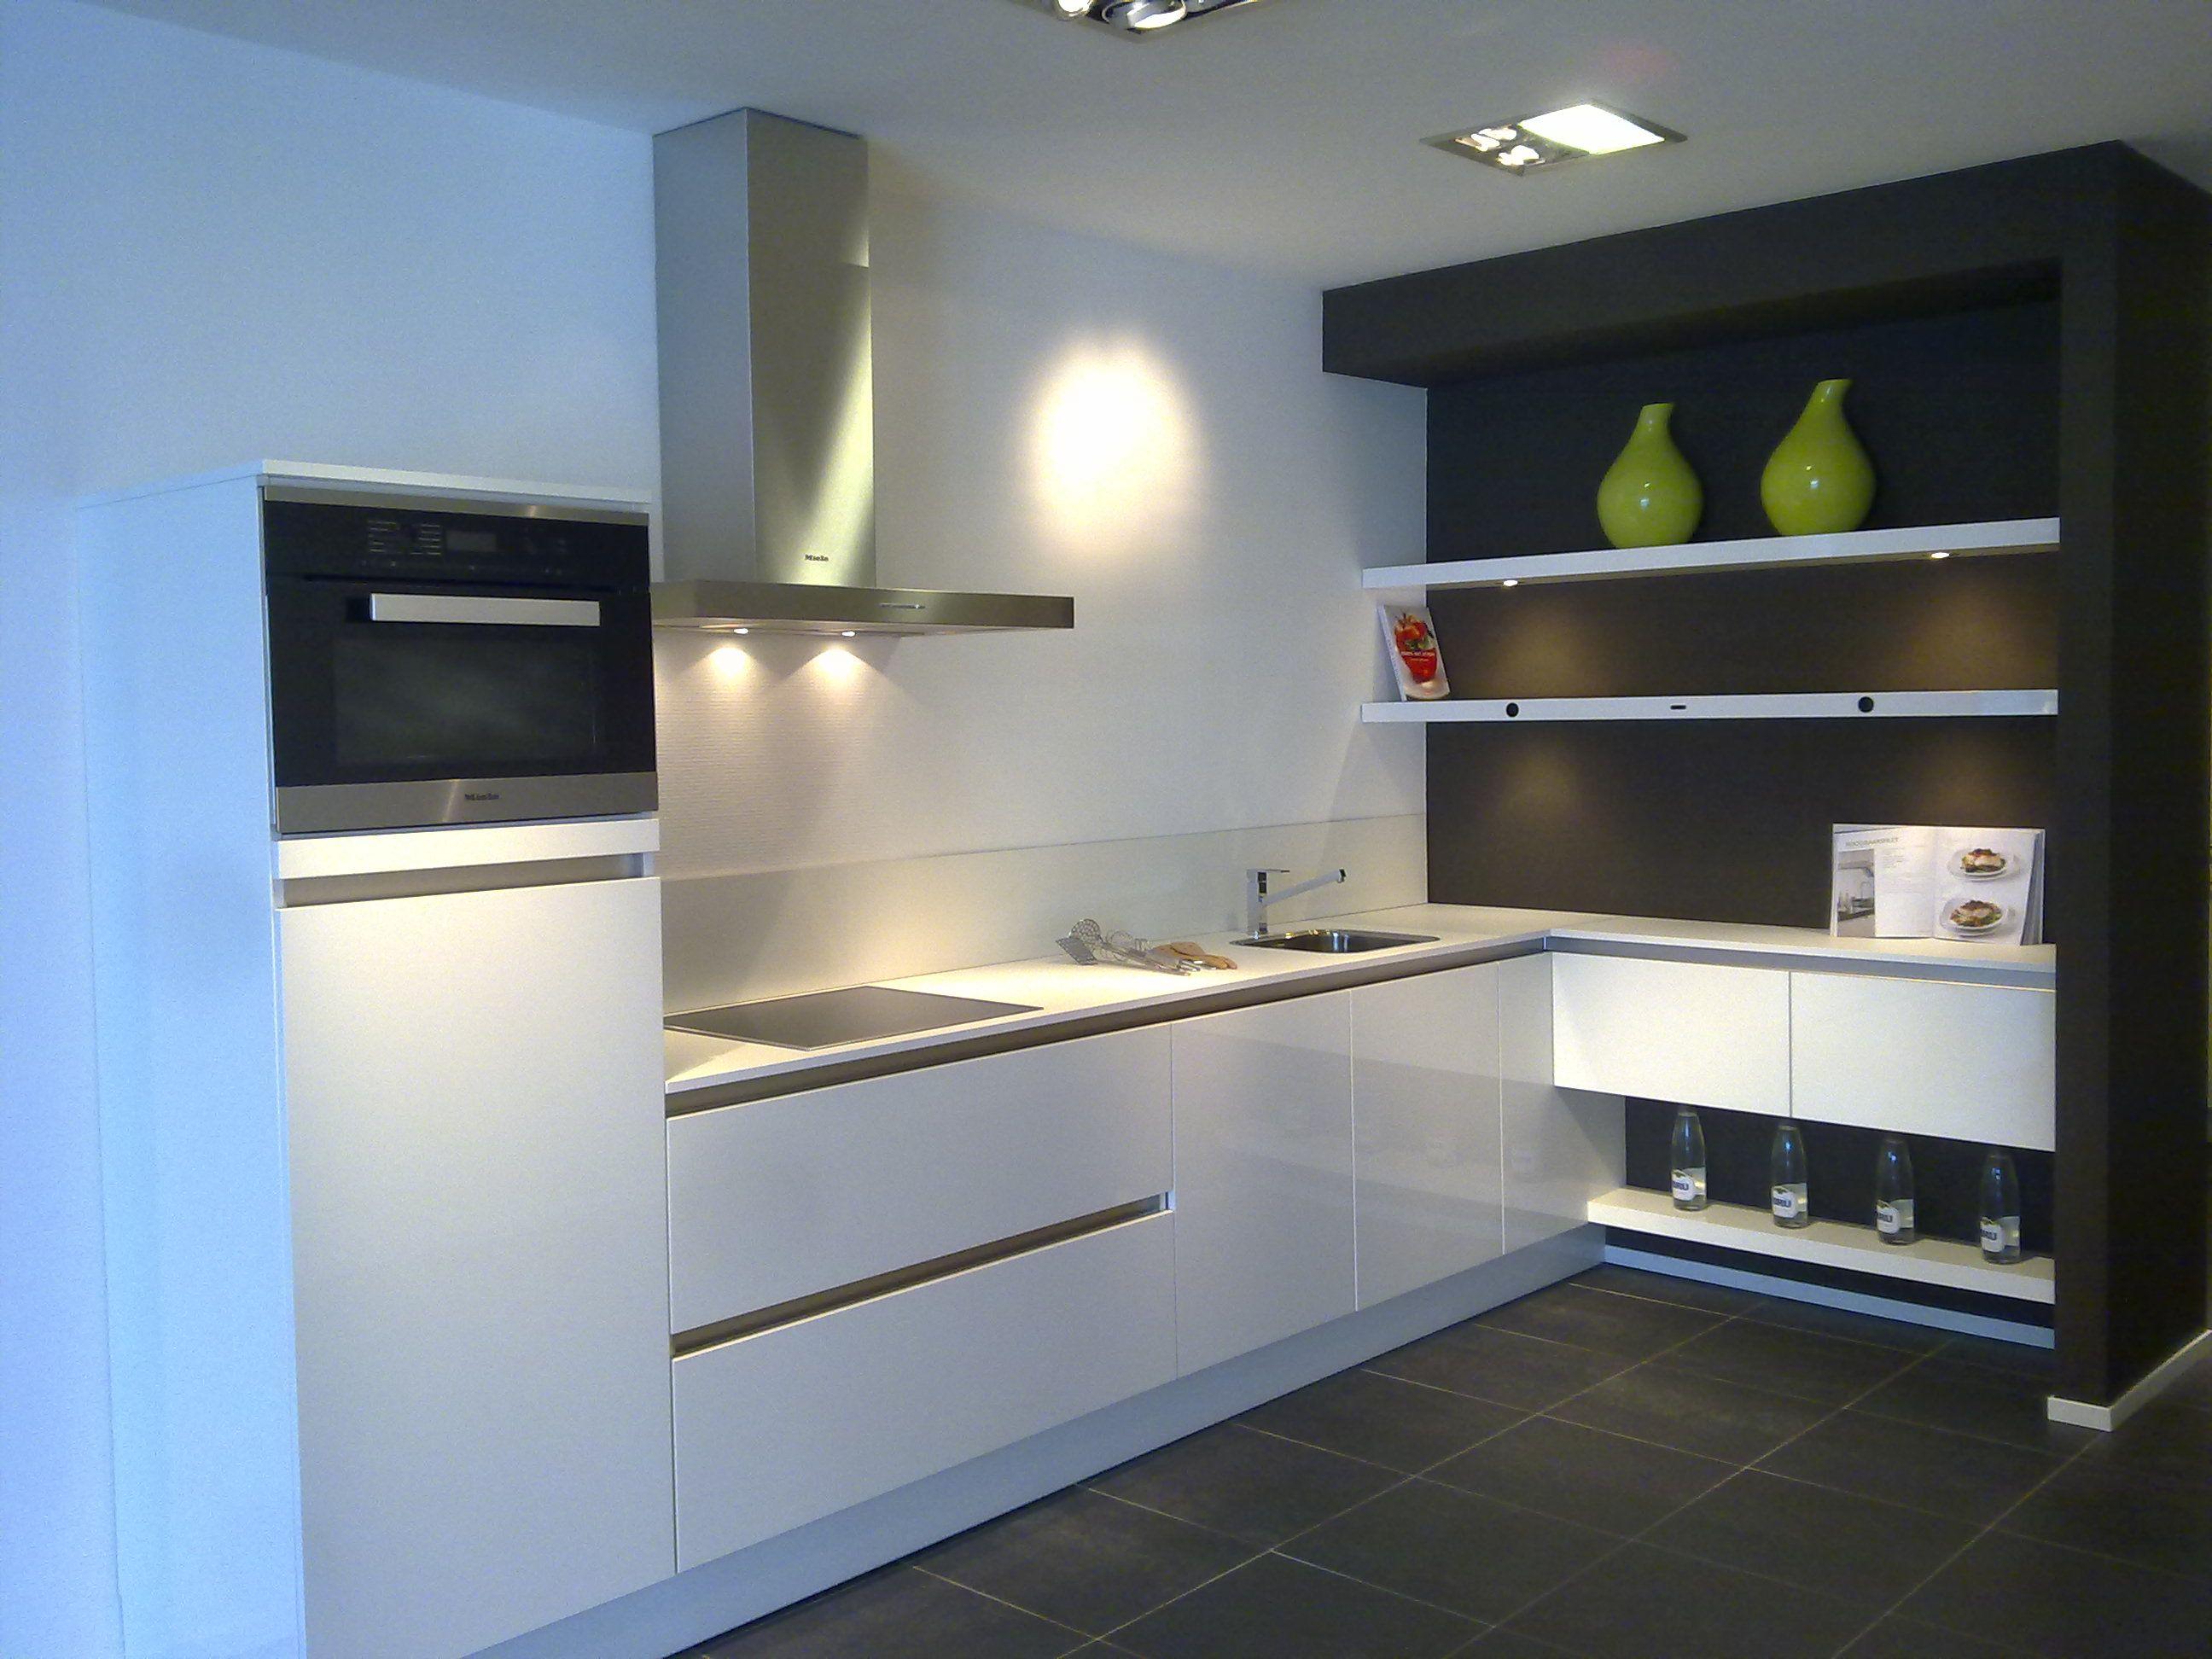 Greeploze Witte Keuken : Showroomuitverkoop greeploze witte hoogglans keller keuken